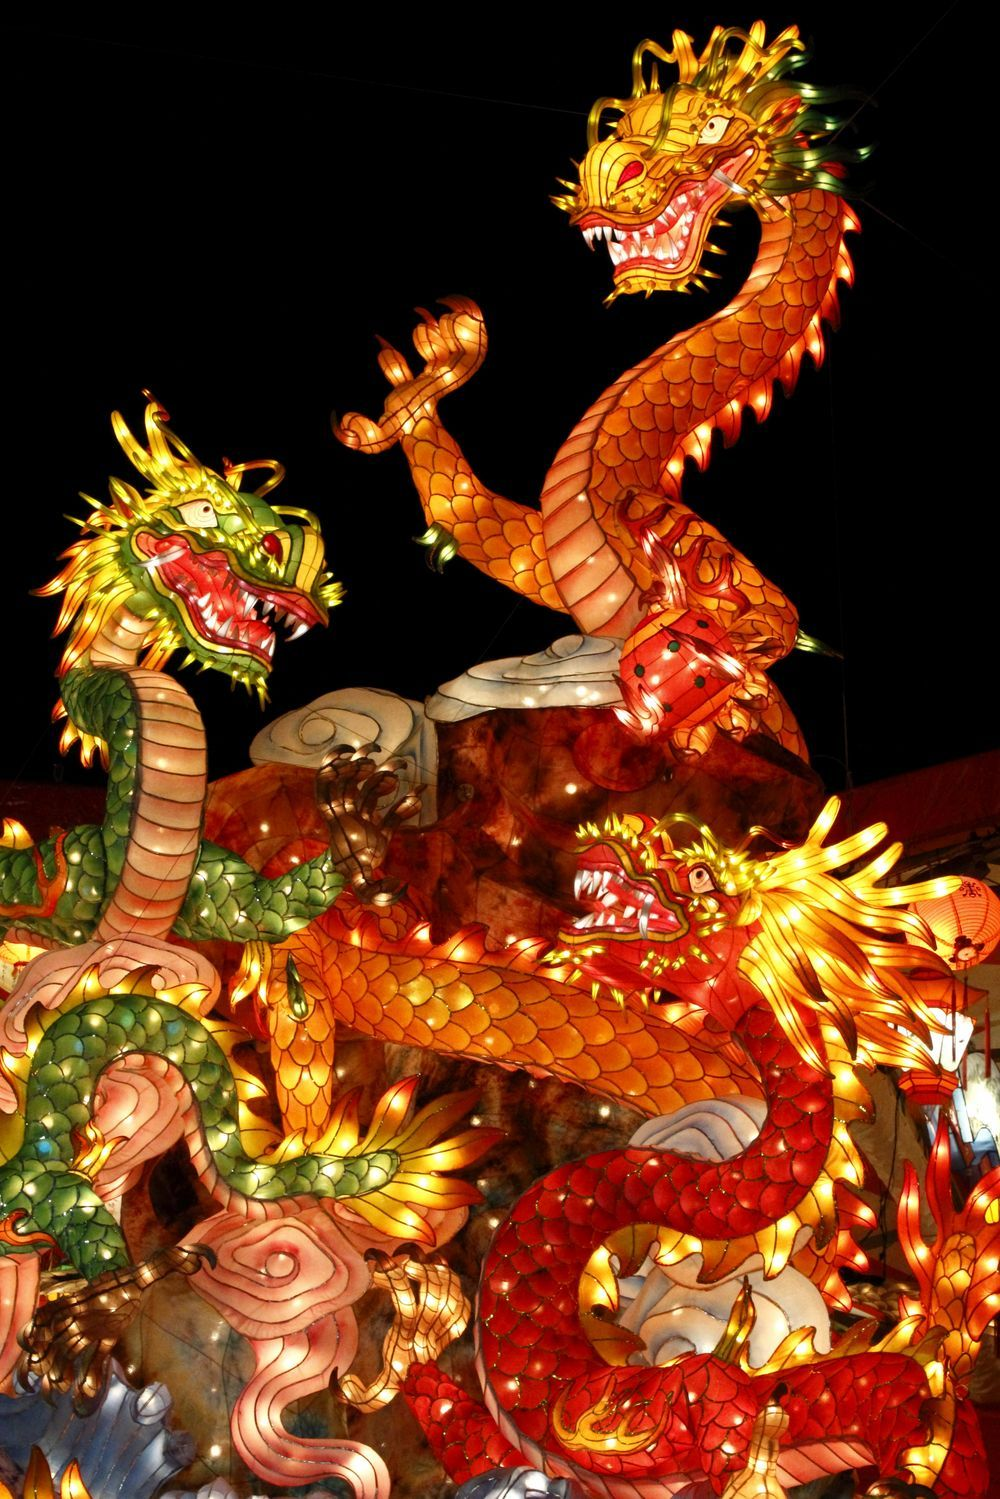 Nagasaki Lantern Festival, Japan ねぶた祭り, 花燈, 長崎ランタンフェスティバル